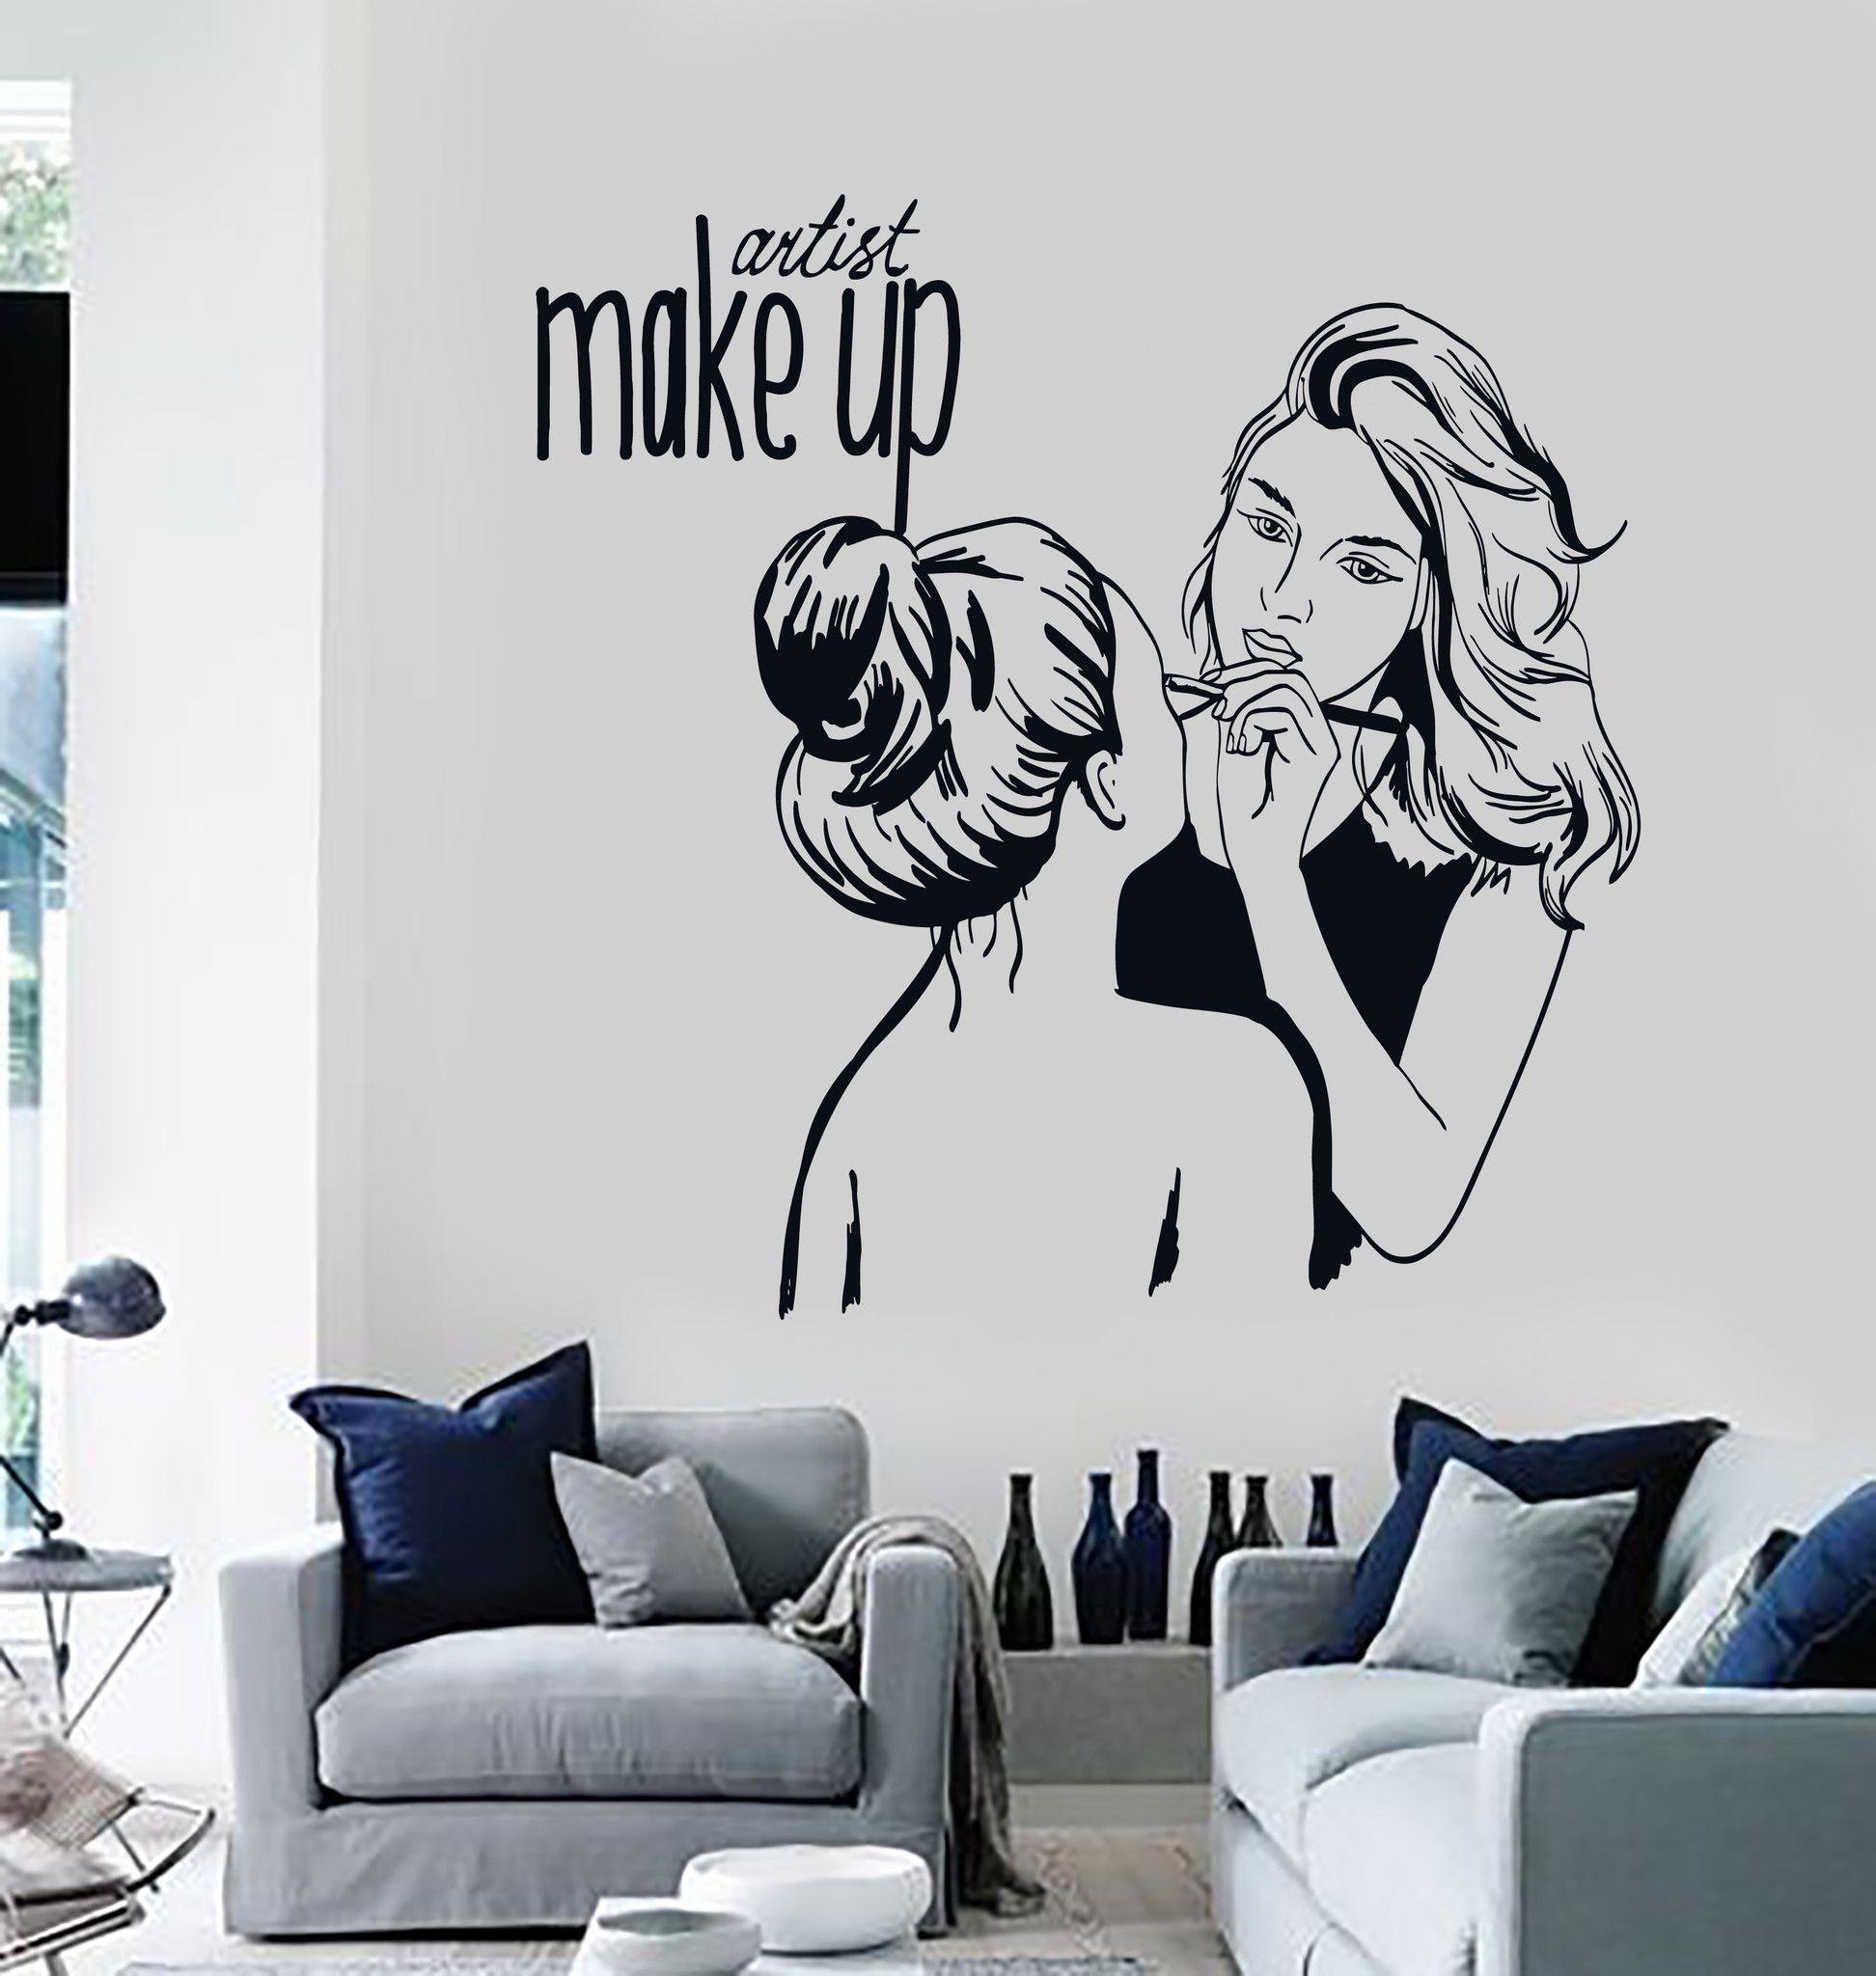 Salon Wallpaper Designs - WallpaperSafari  |Beauty Salon Wallpaper Designs